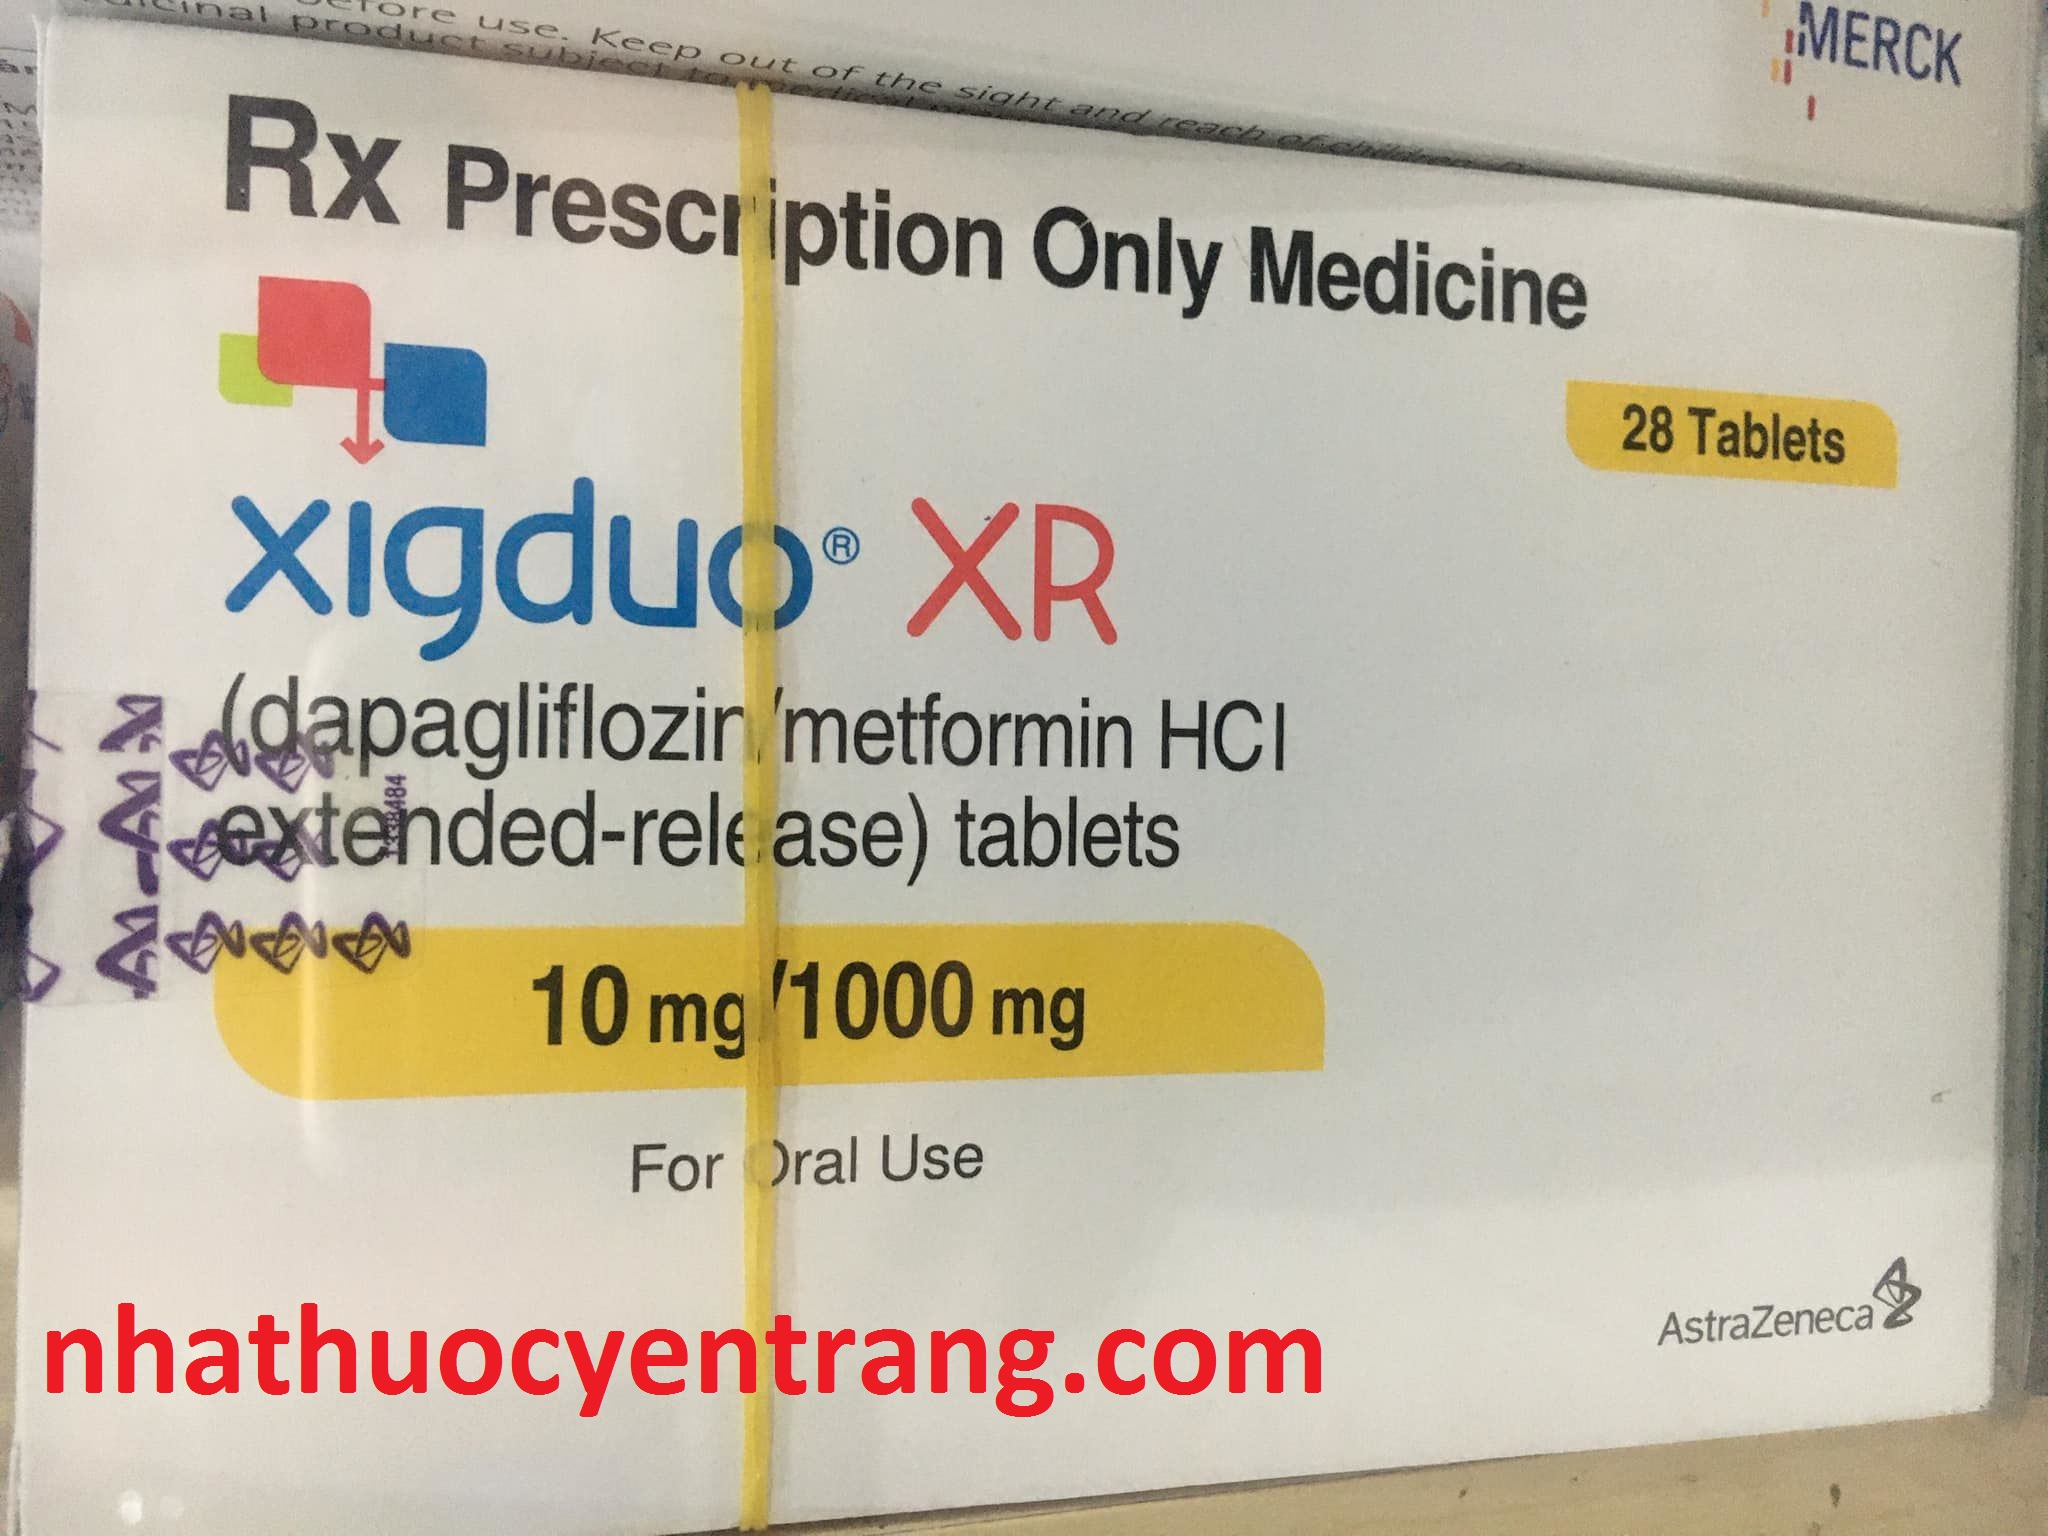 Xigduo XR 10/1000 mg